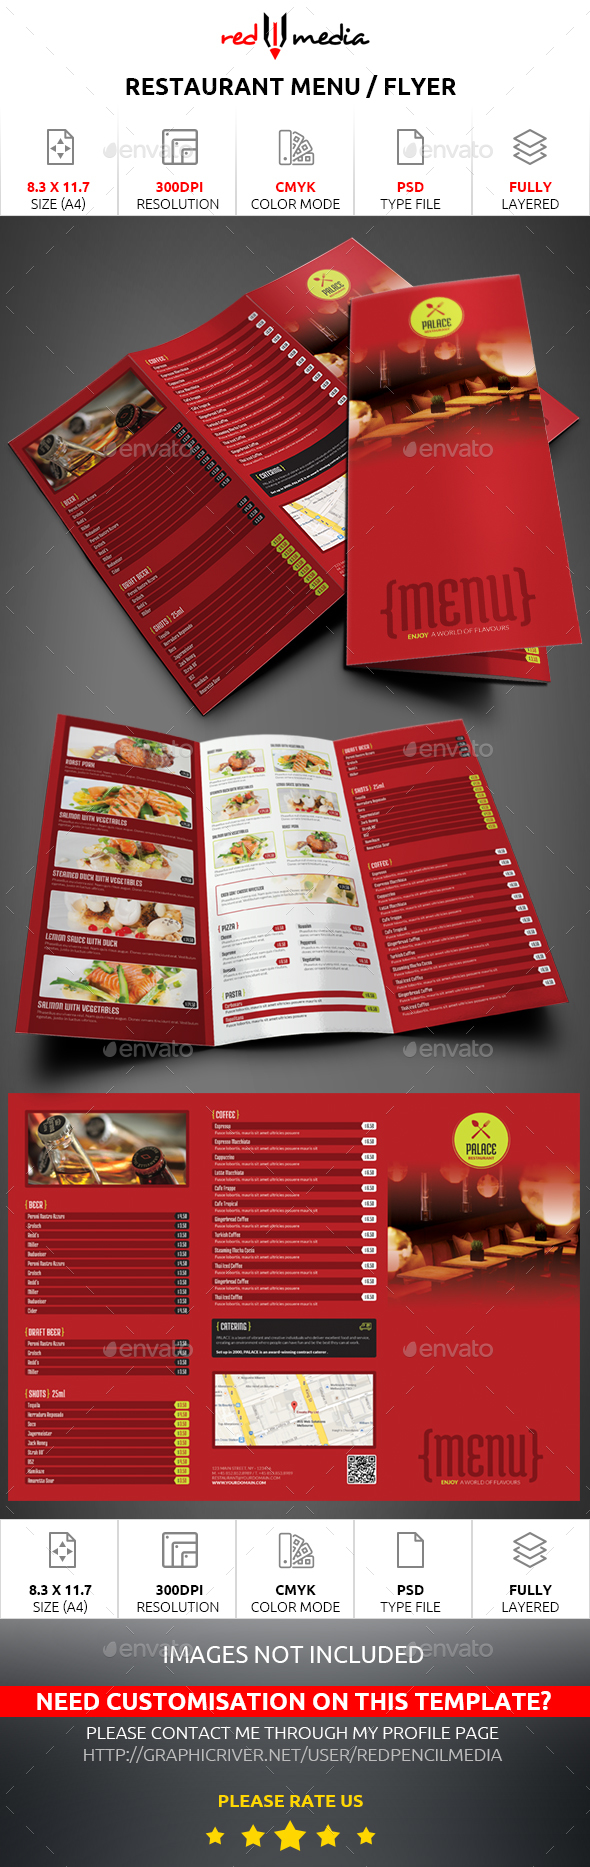 Restaurant Trifold Menu / Flyer